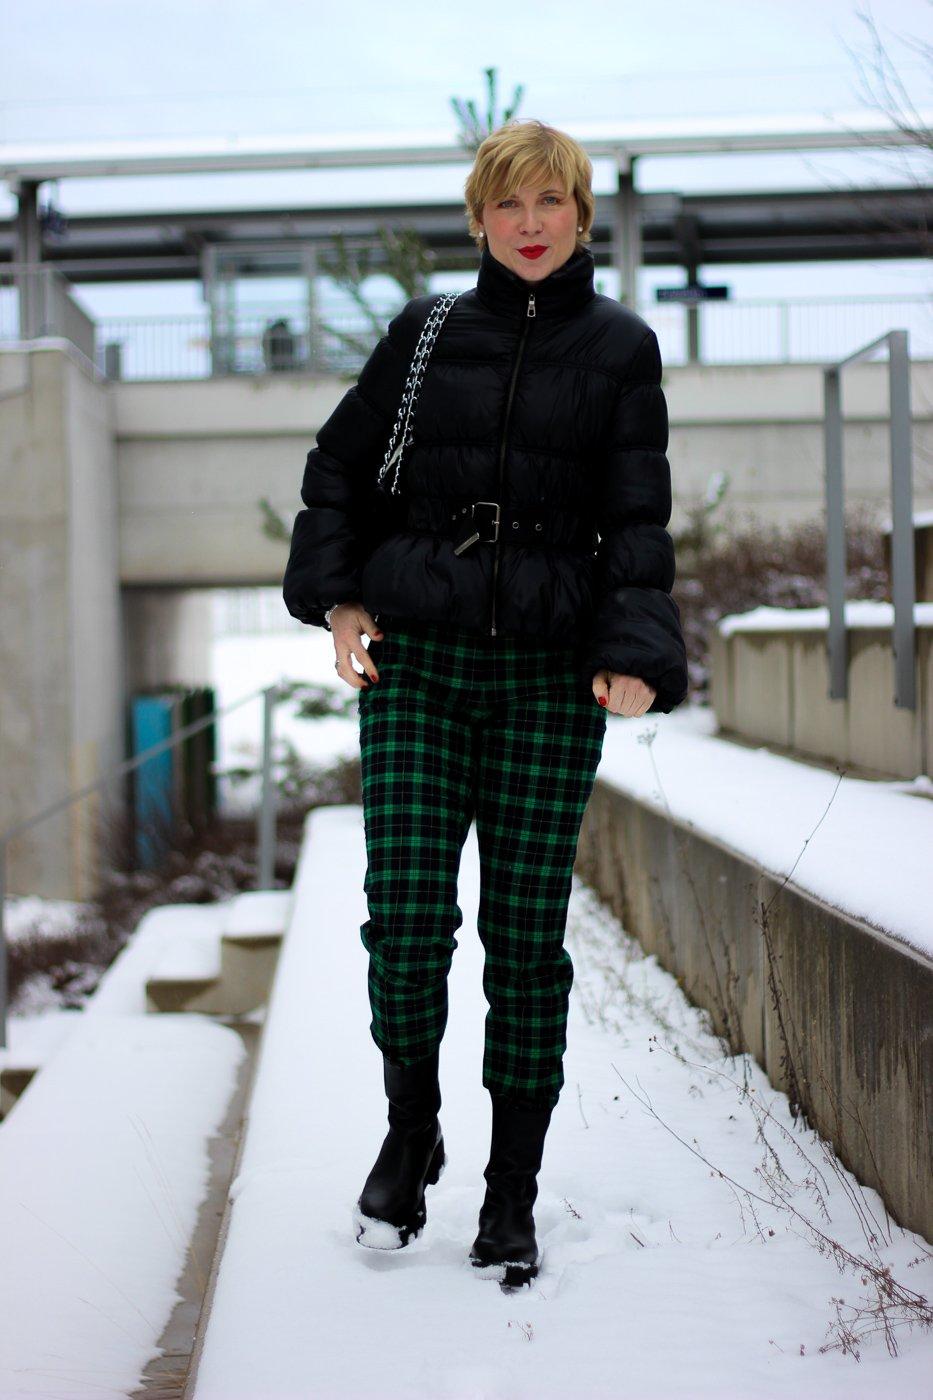 conny doll lifestyle: grüne Karohose, bunt, Winterstyling, Chunkyboots